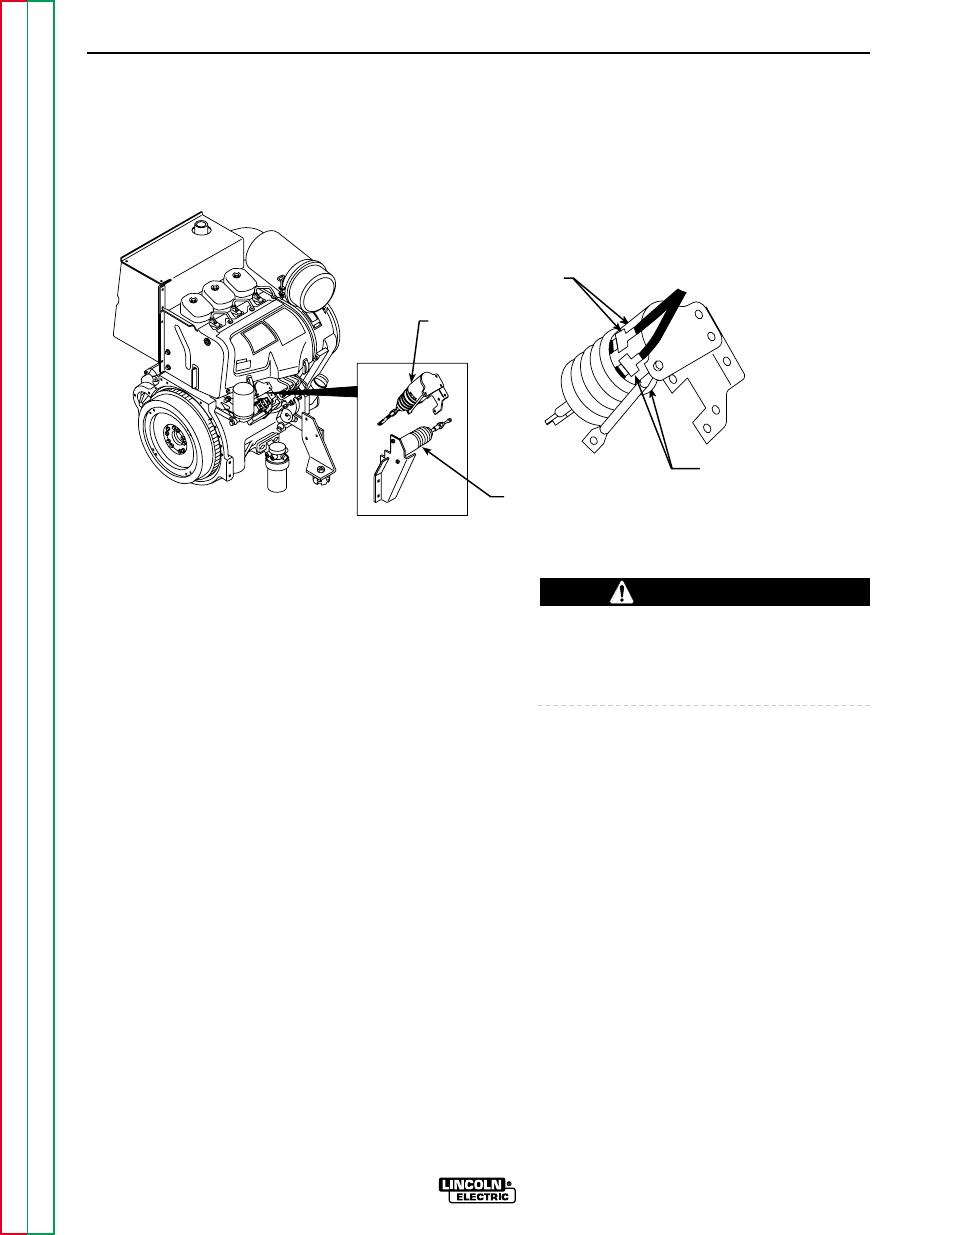 Troubleshooting & repair, Shutdown solenoid test (continued